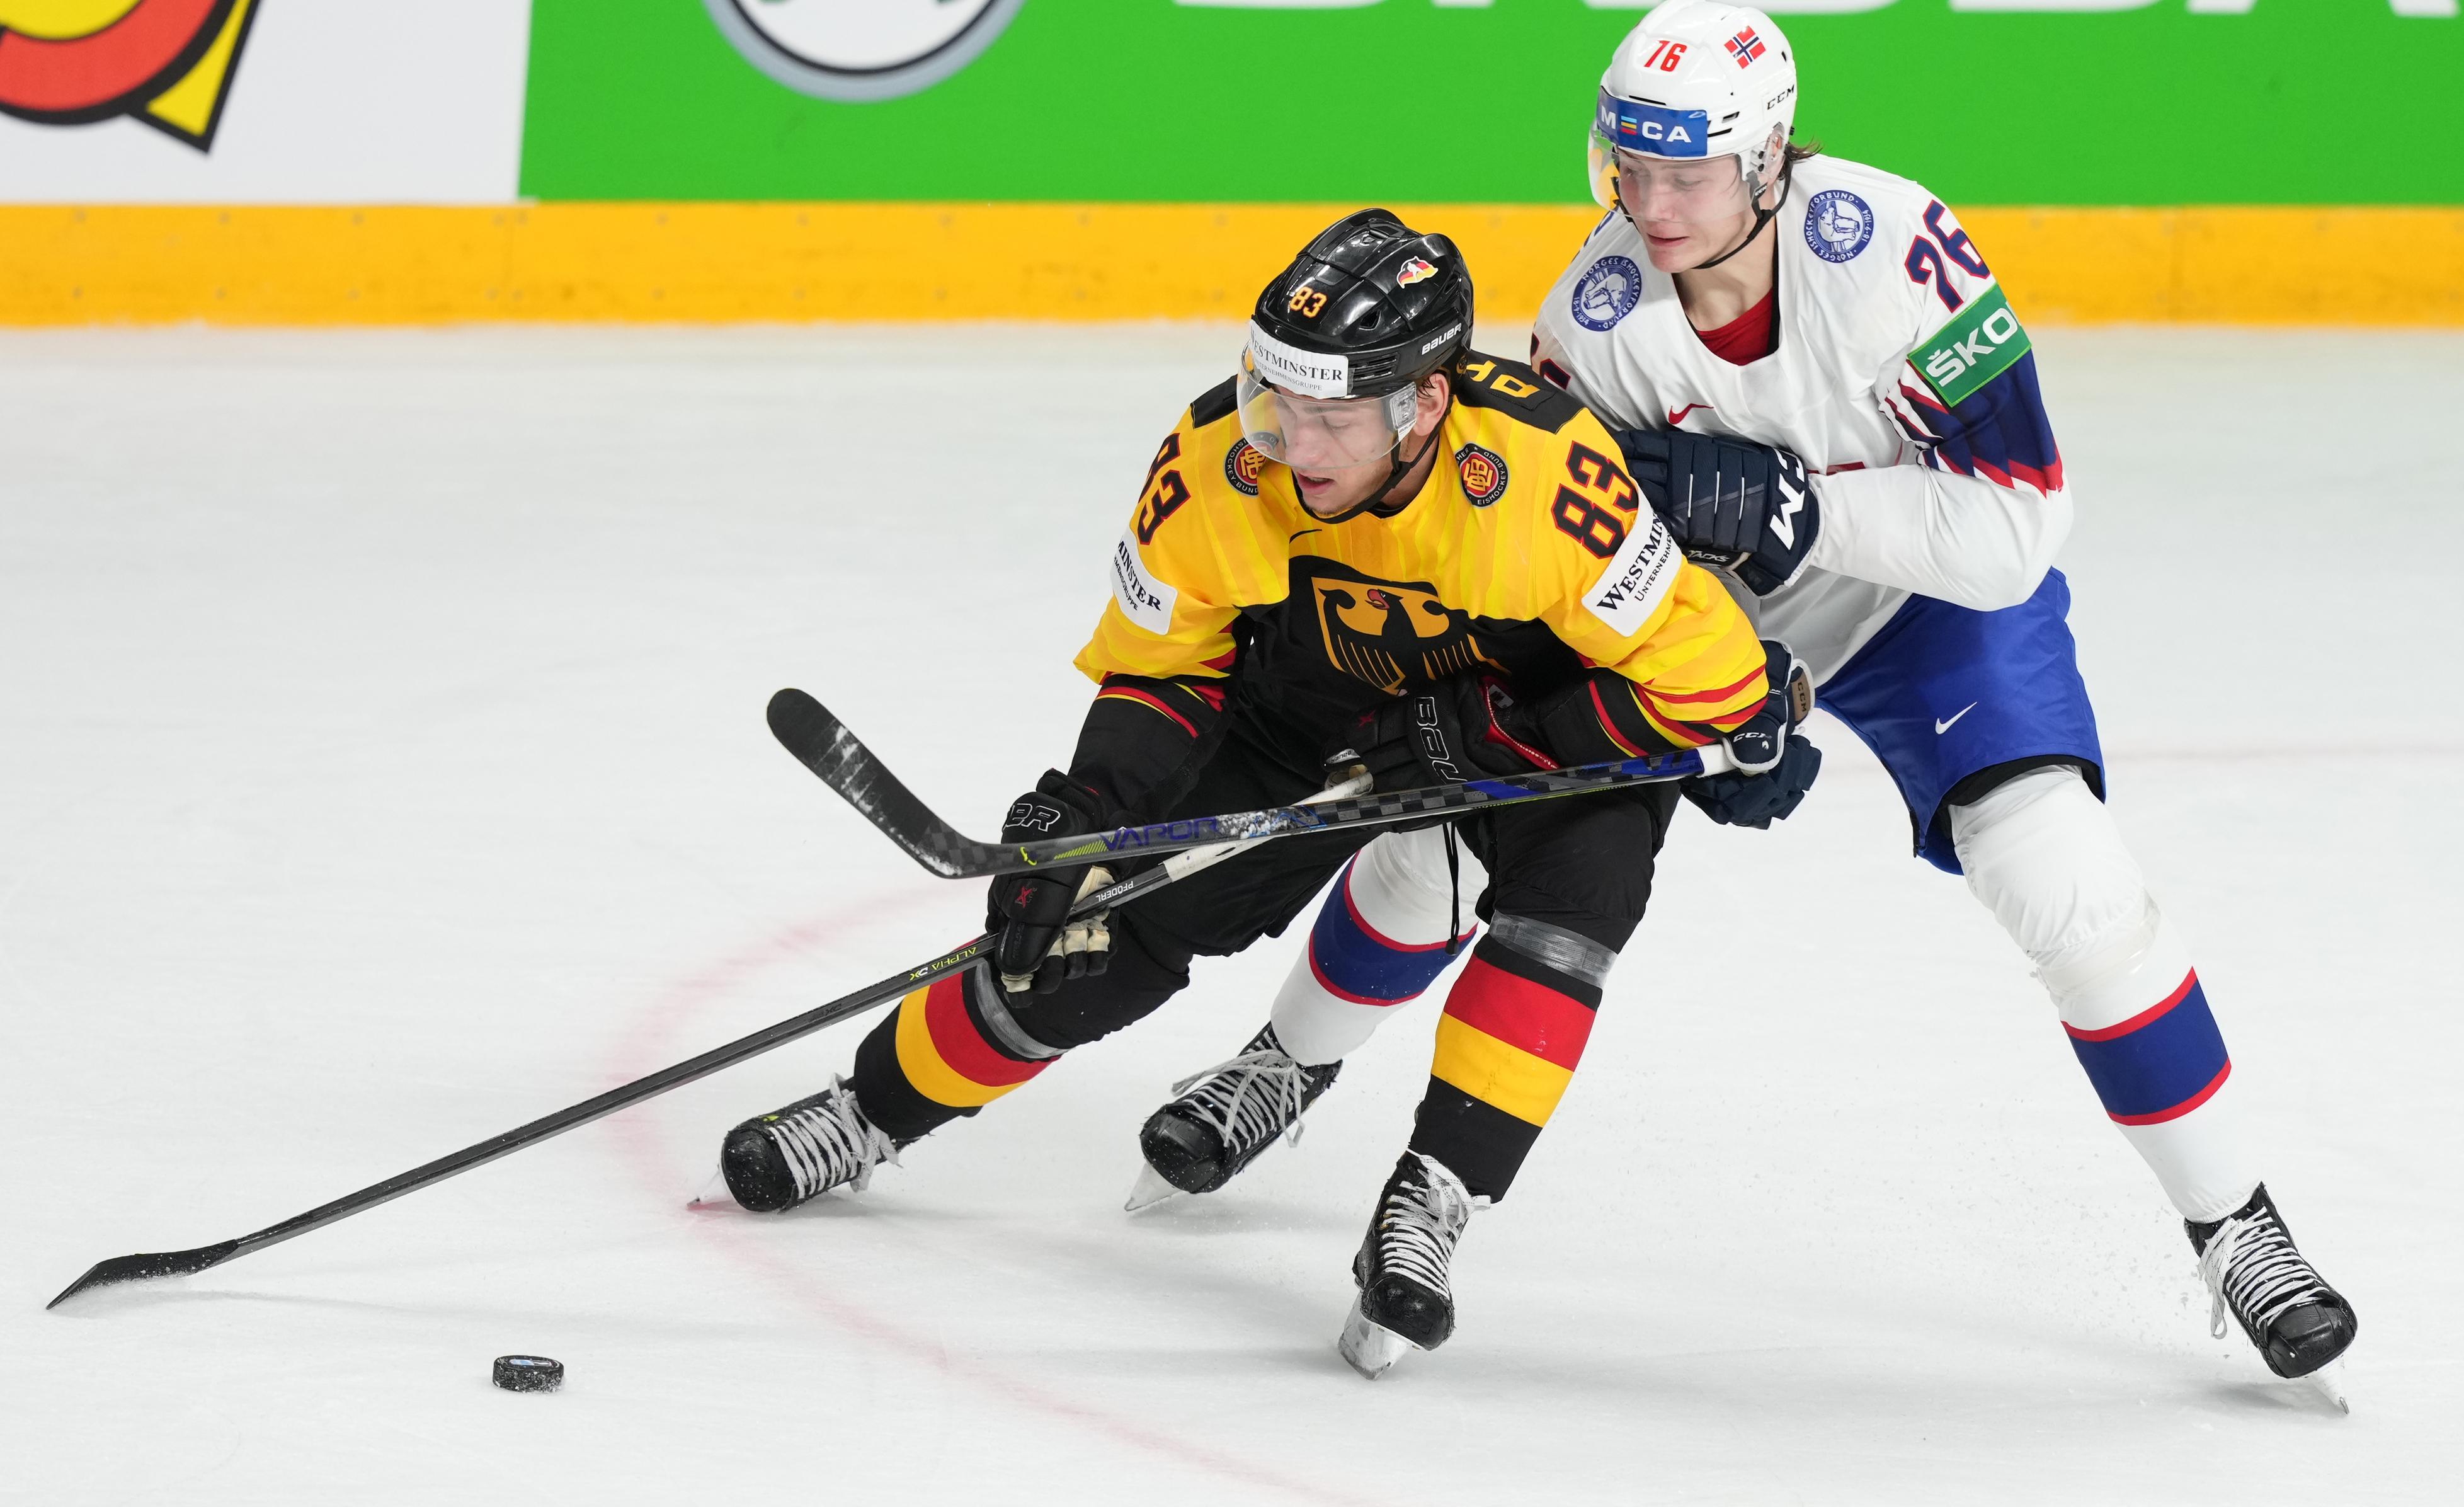 Ice Hockey World Championship: Norway - Germany